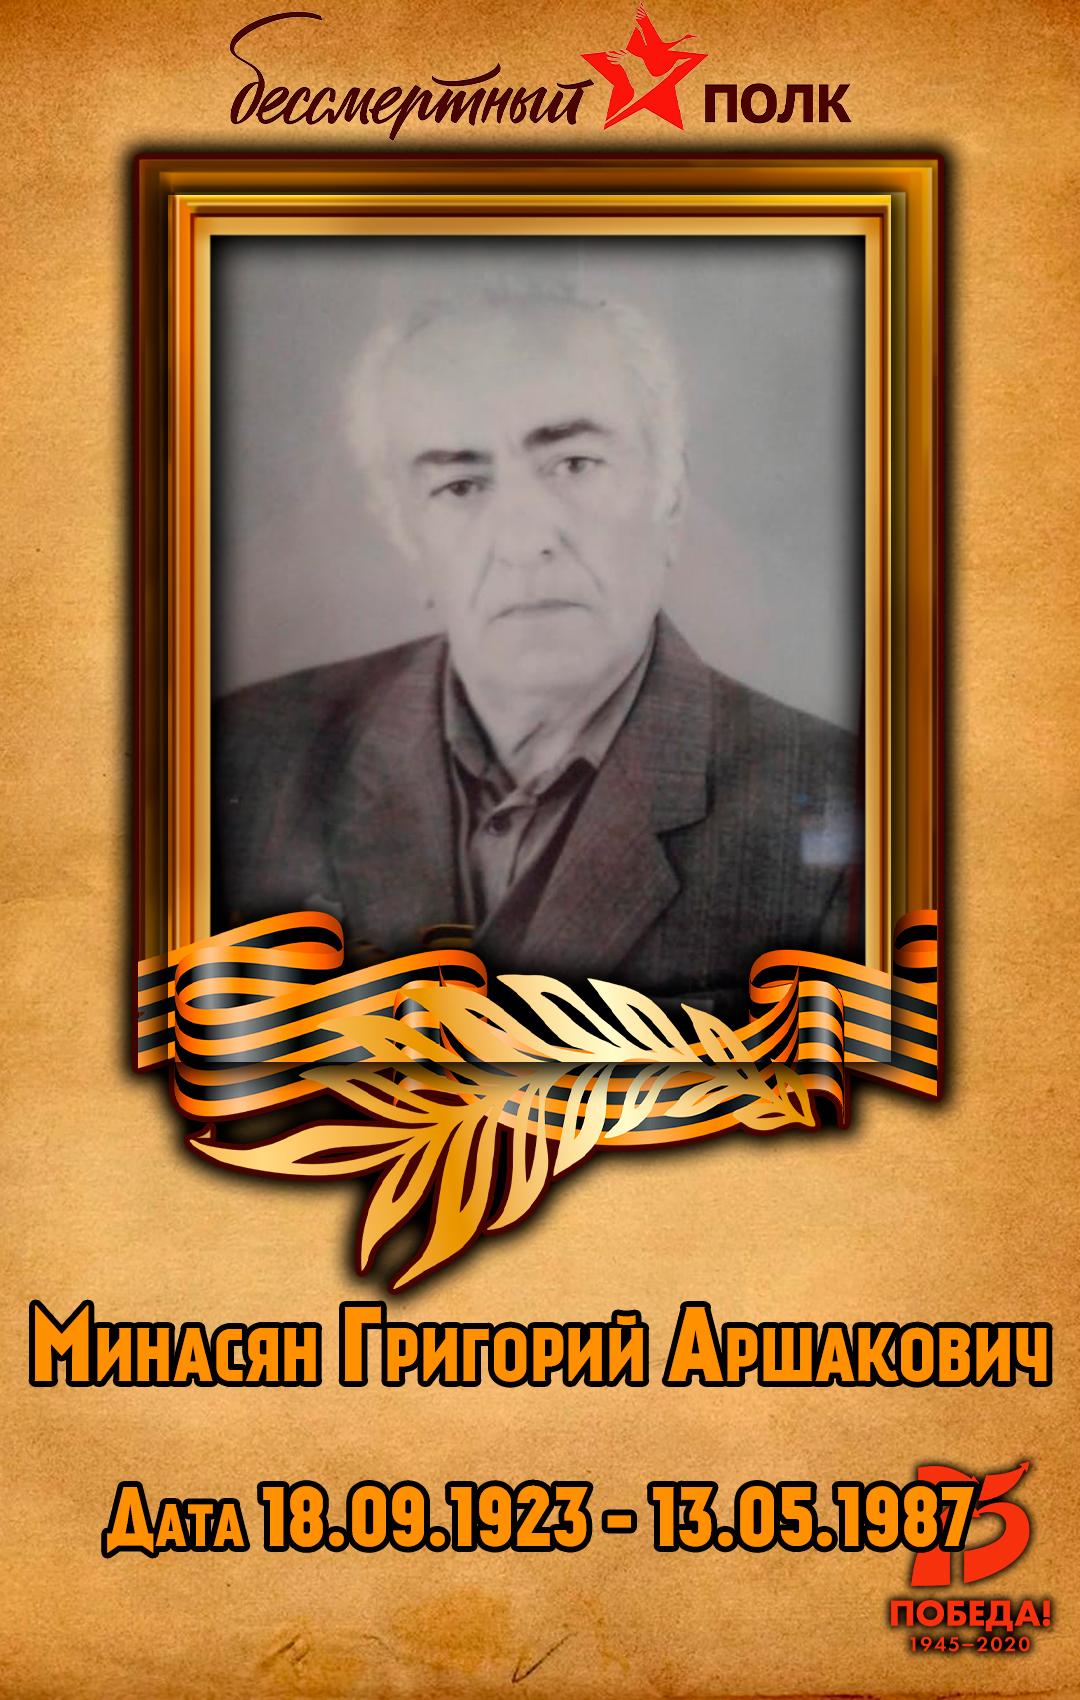 Минасян-Григорий-Аршакович